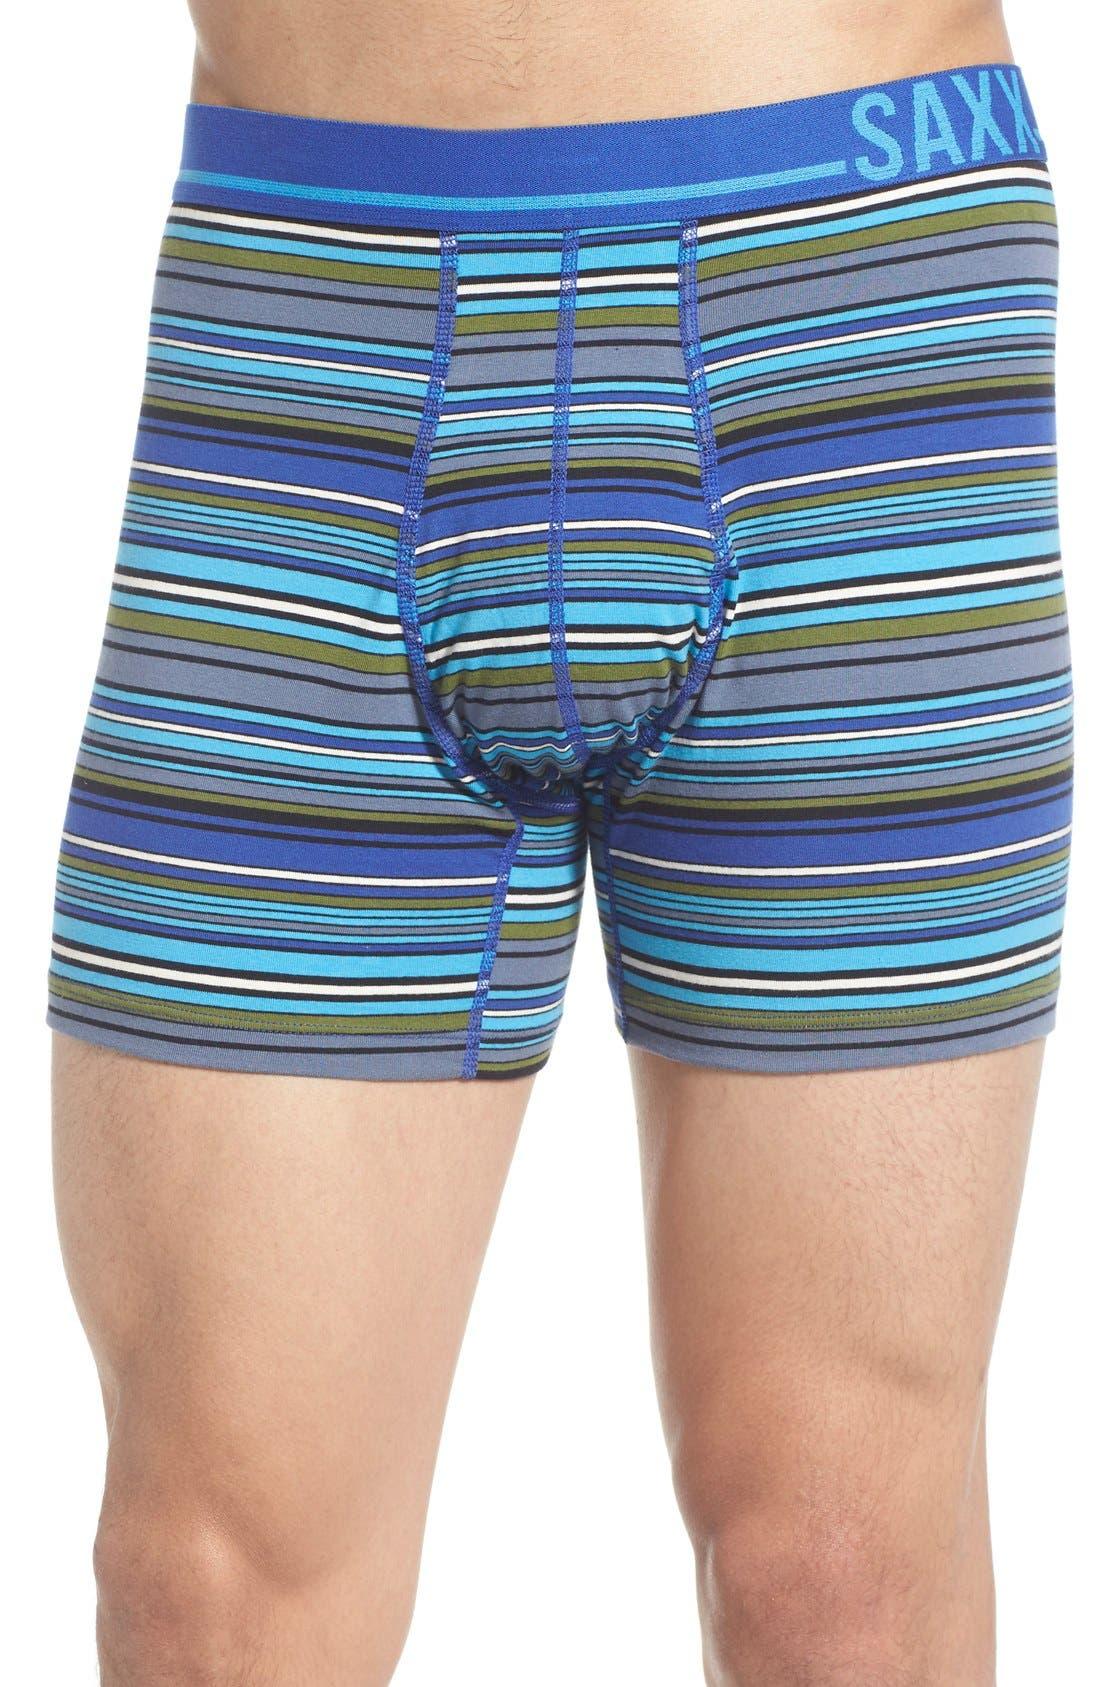 365 Boxer Briefs,                         Main,                         color, Cobalt Blanket Stripe